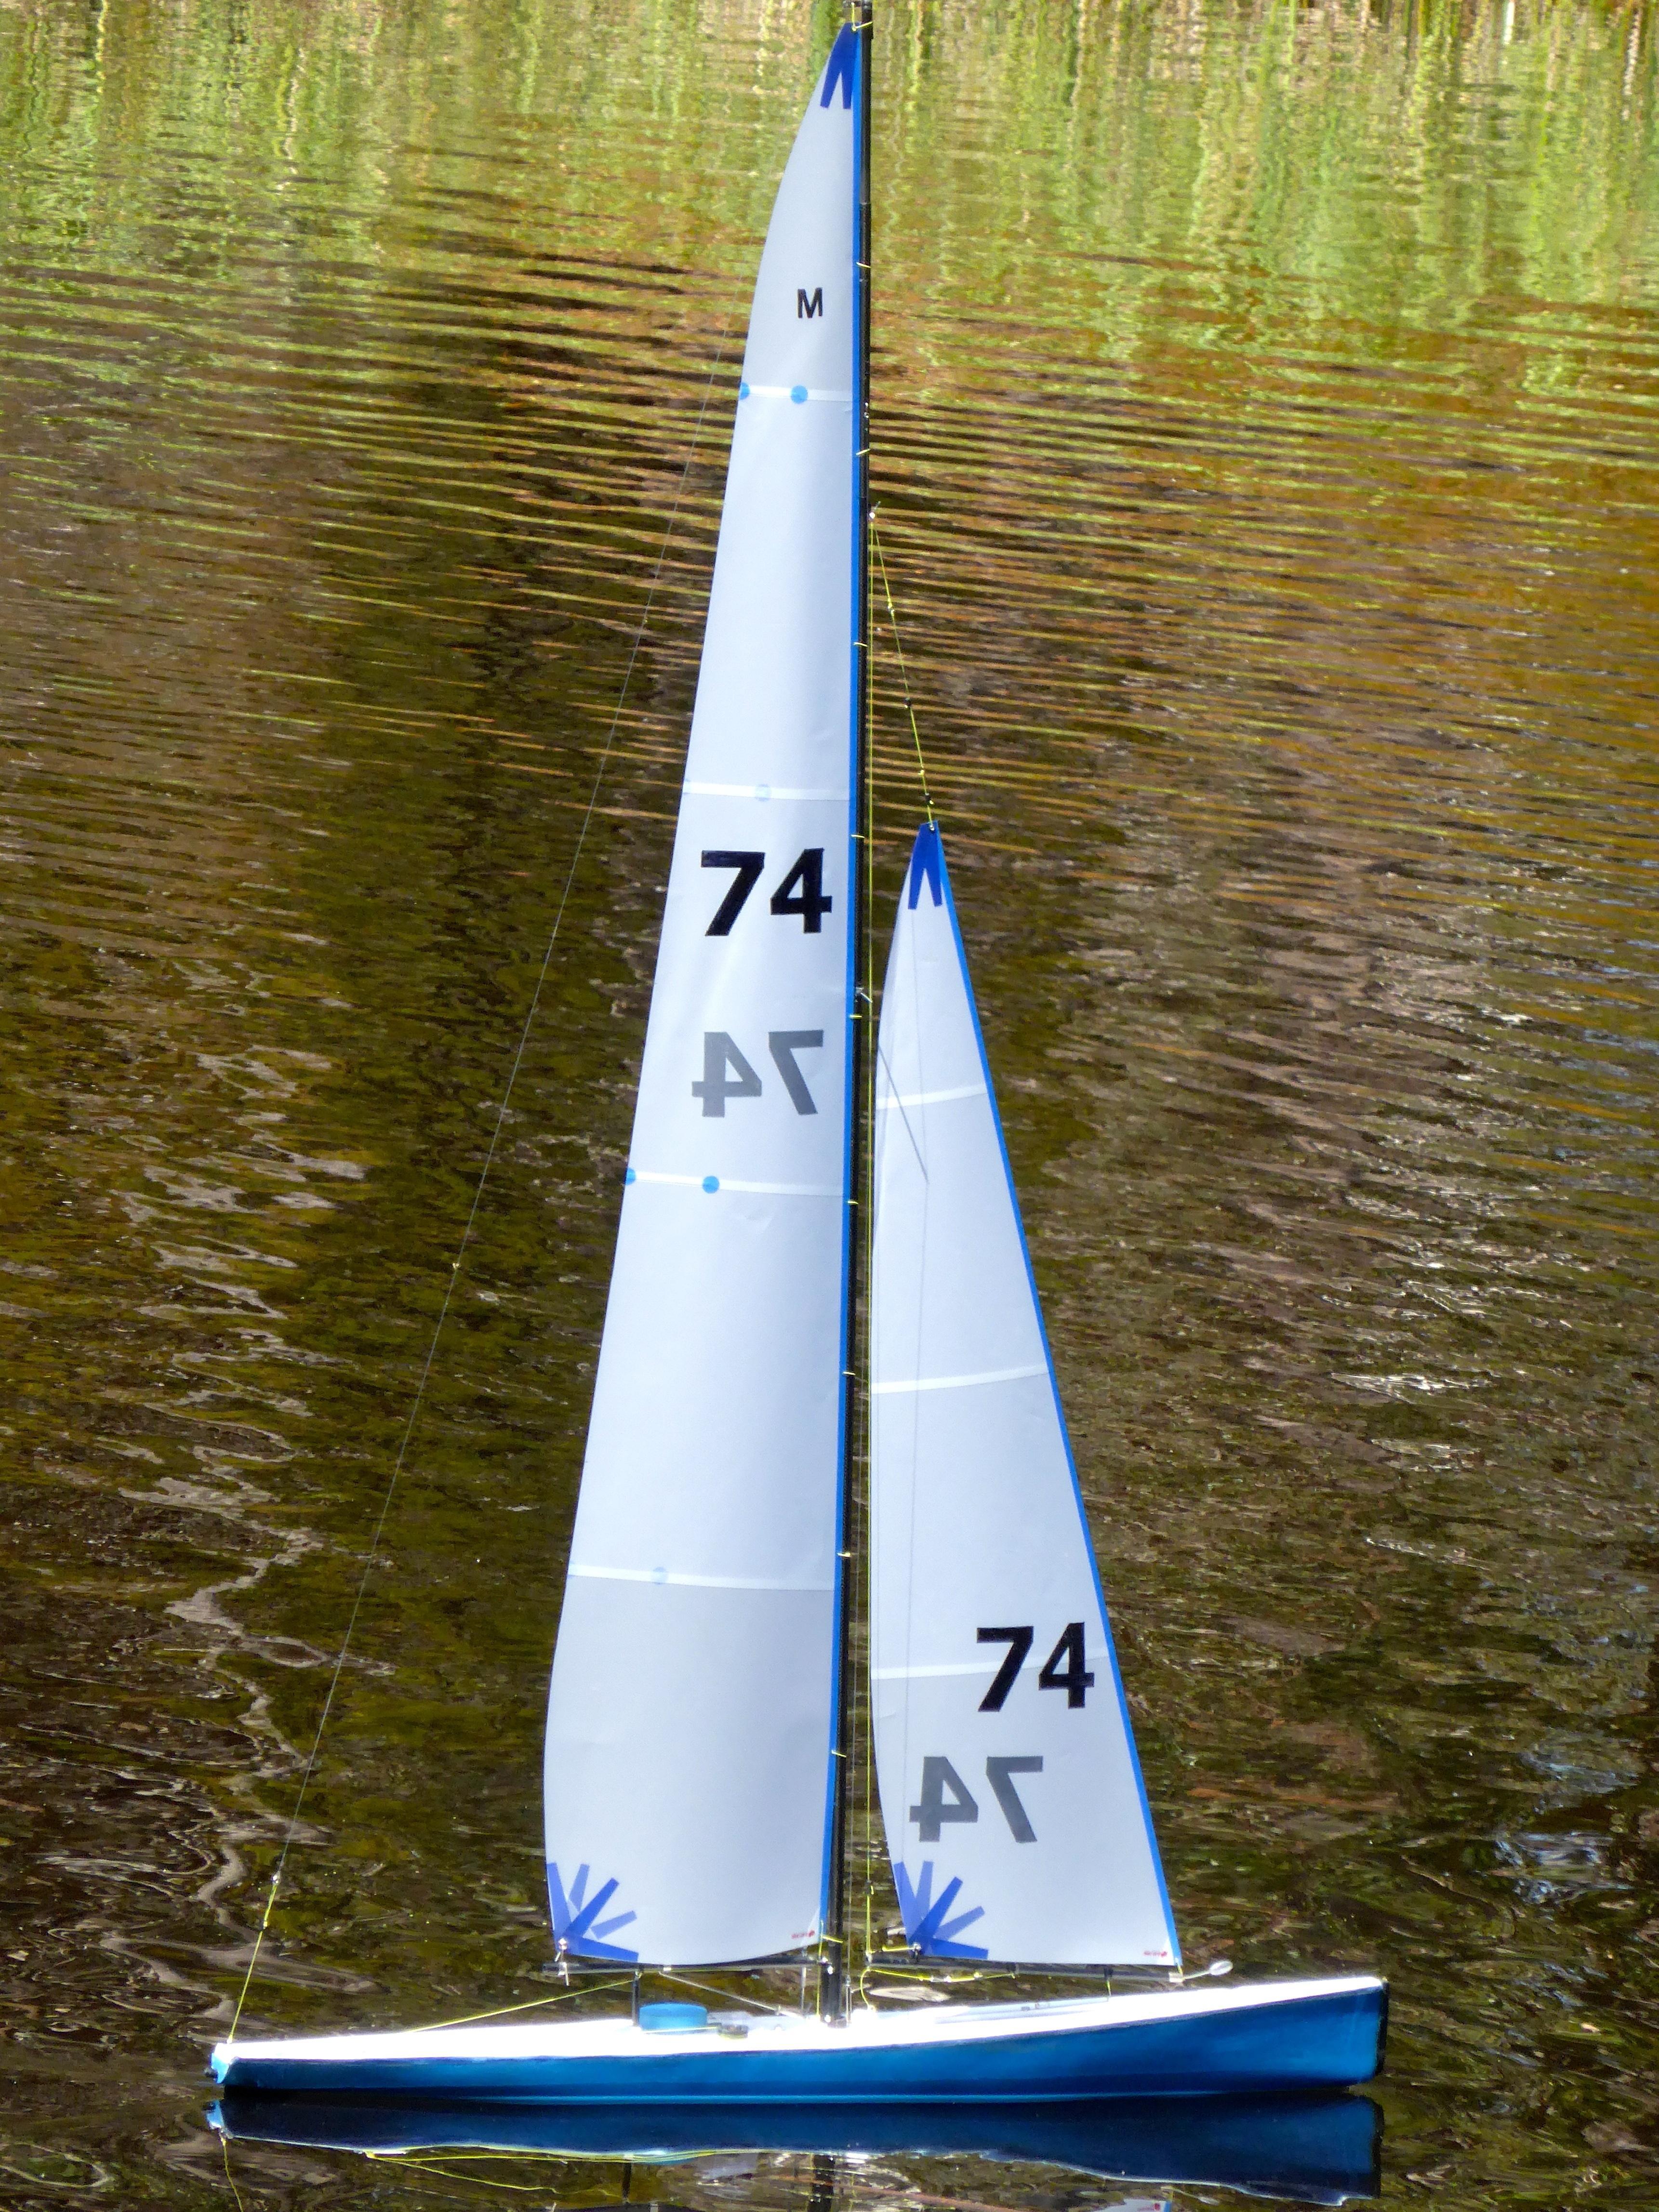 Free Images : water, wing, boat, oar, vessel, vehicle, mast